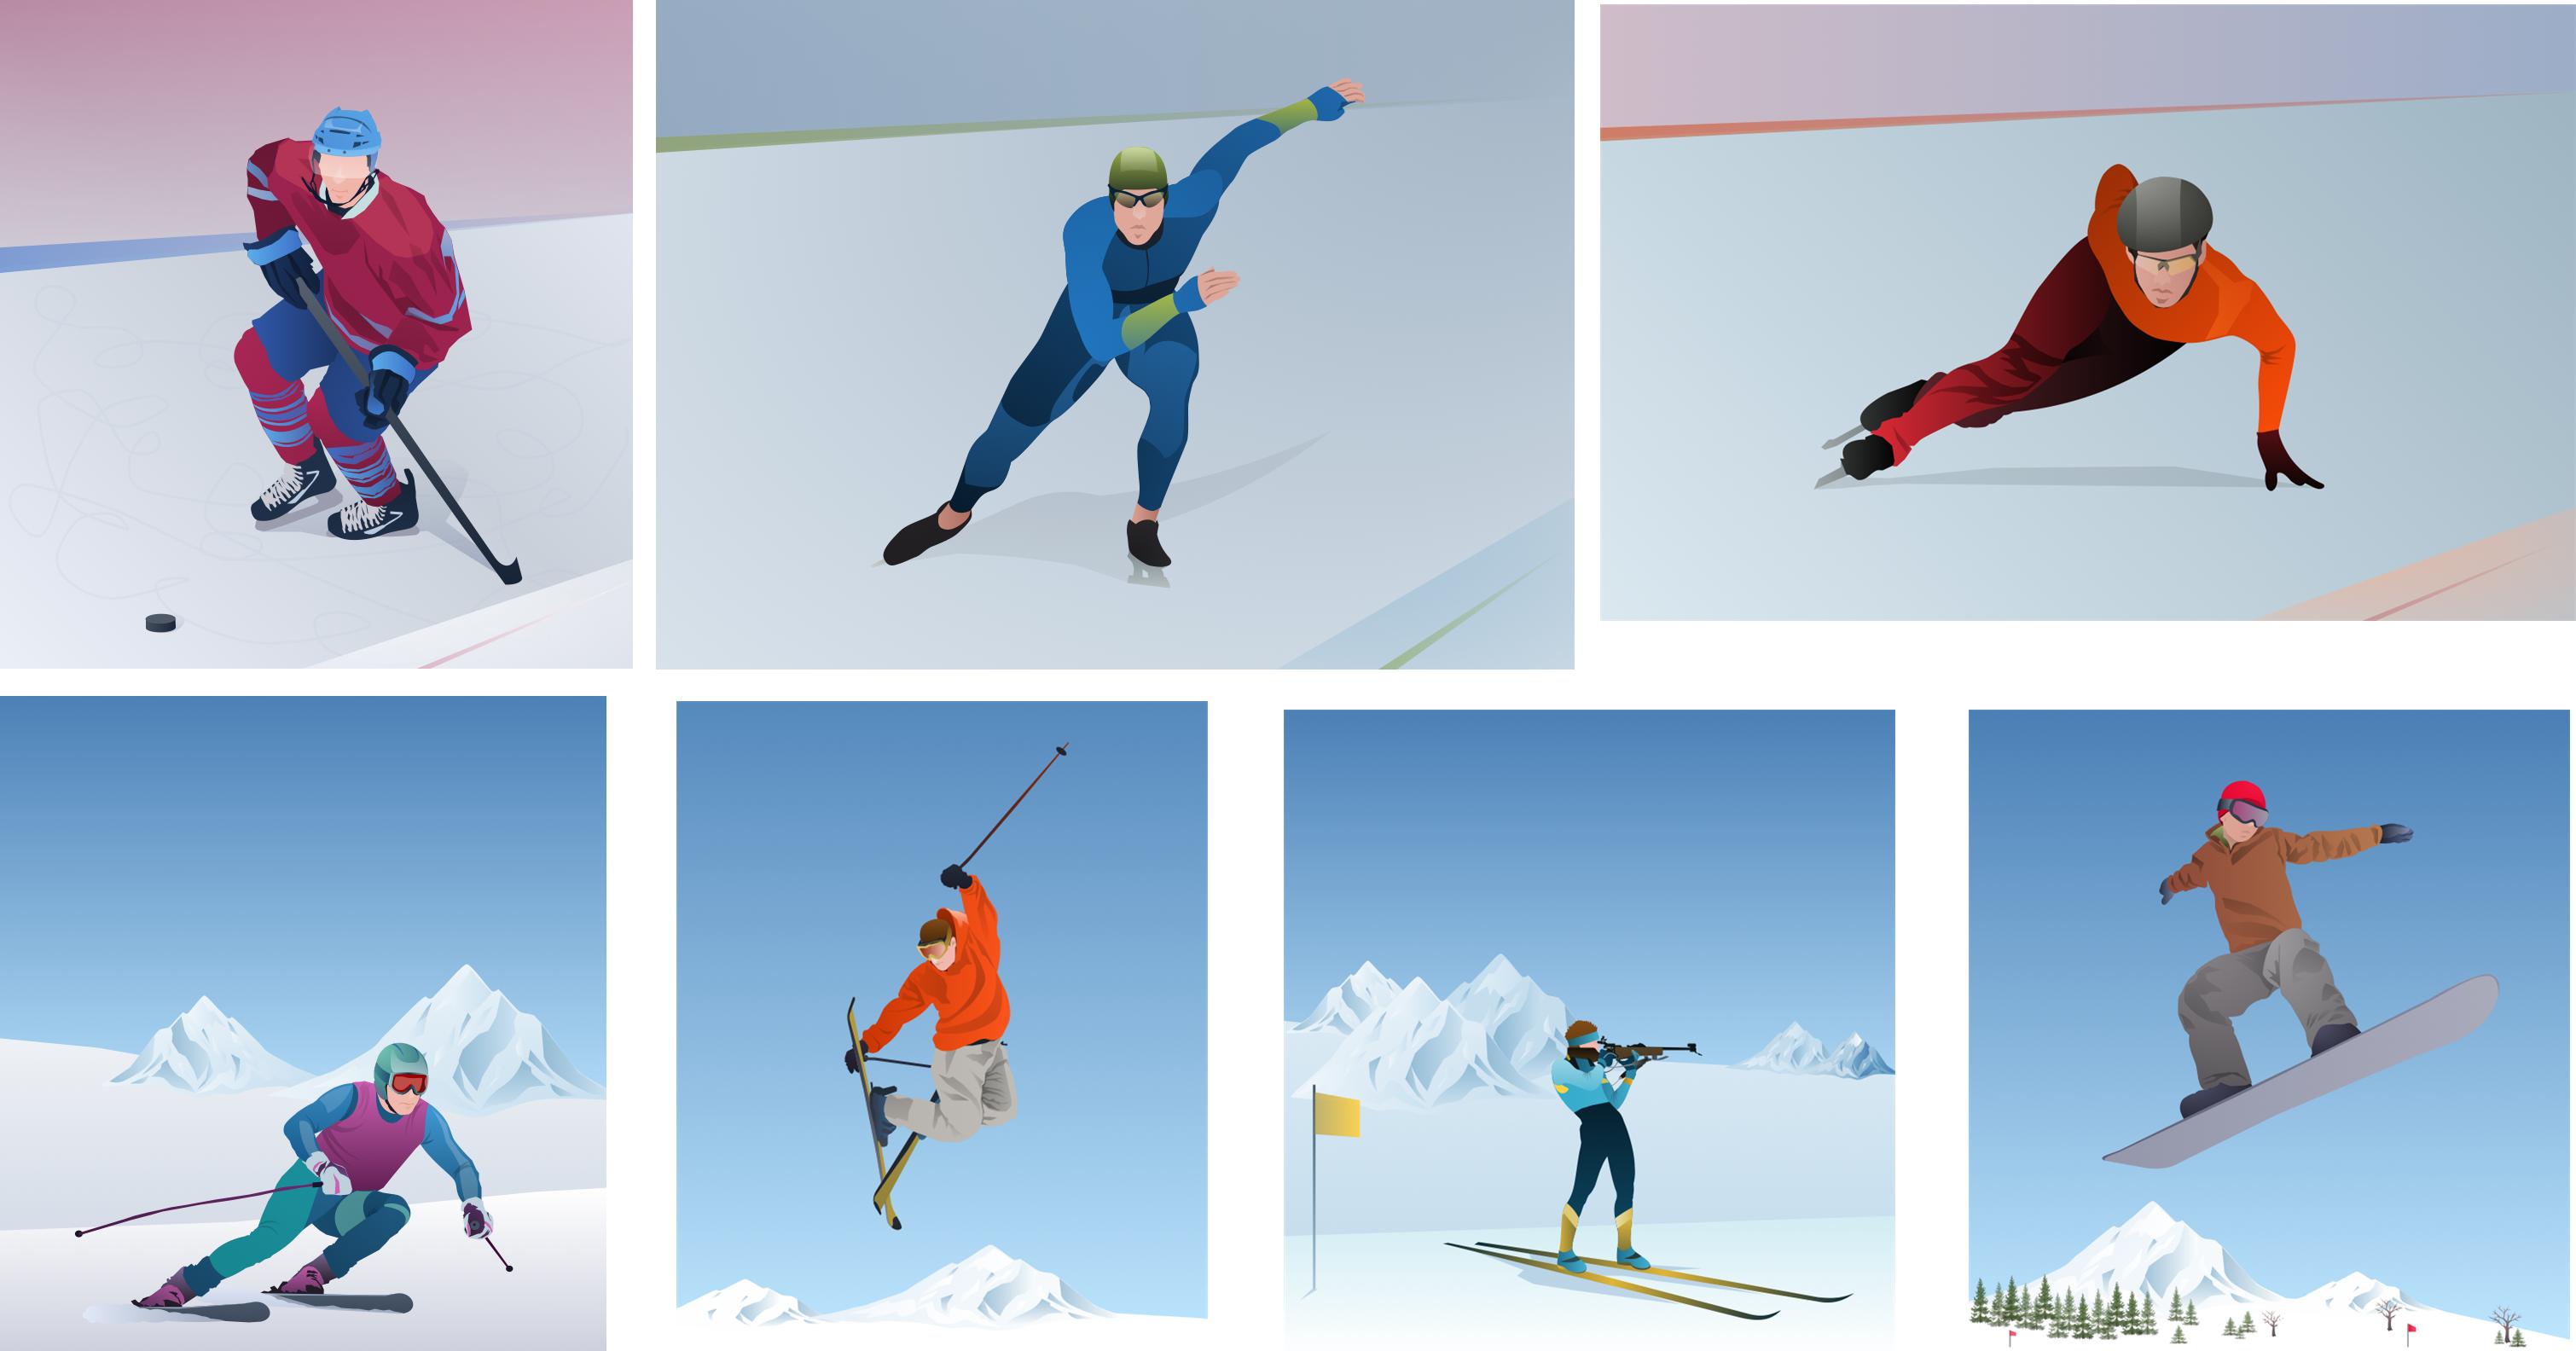 Winter Olympics Sports Clipart.